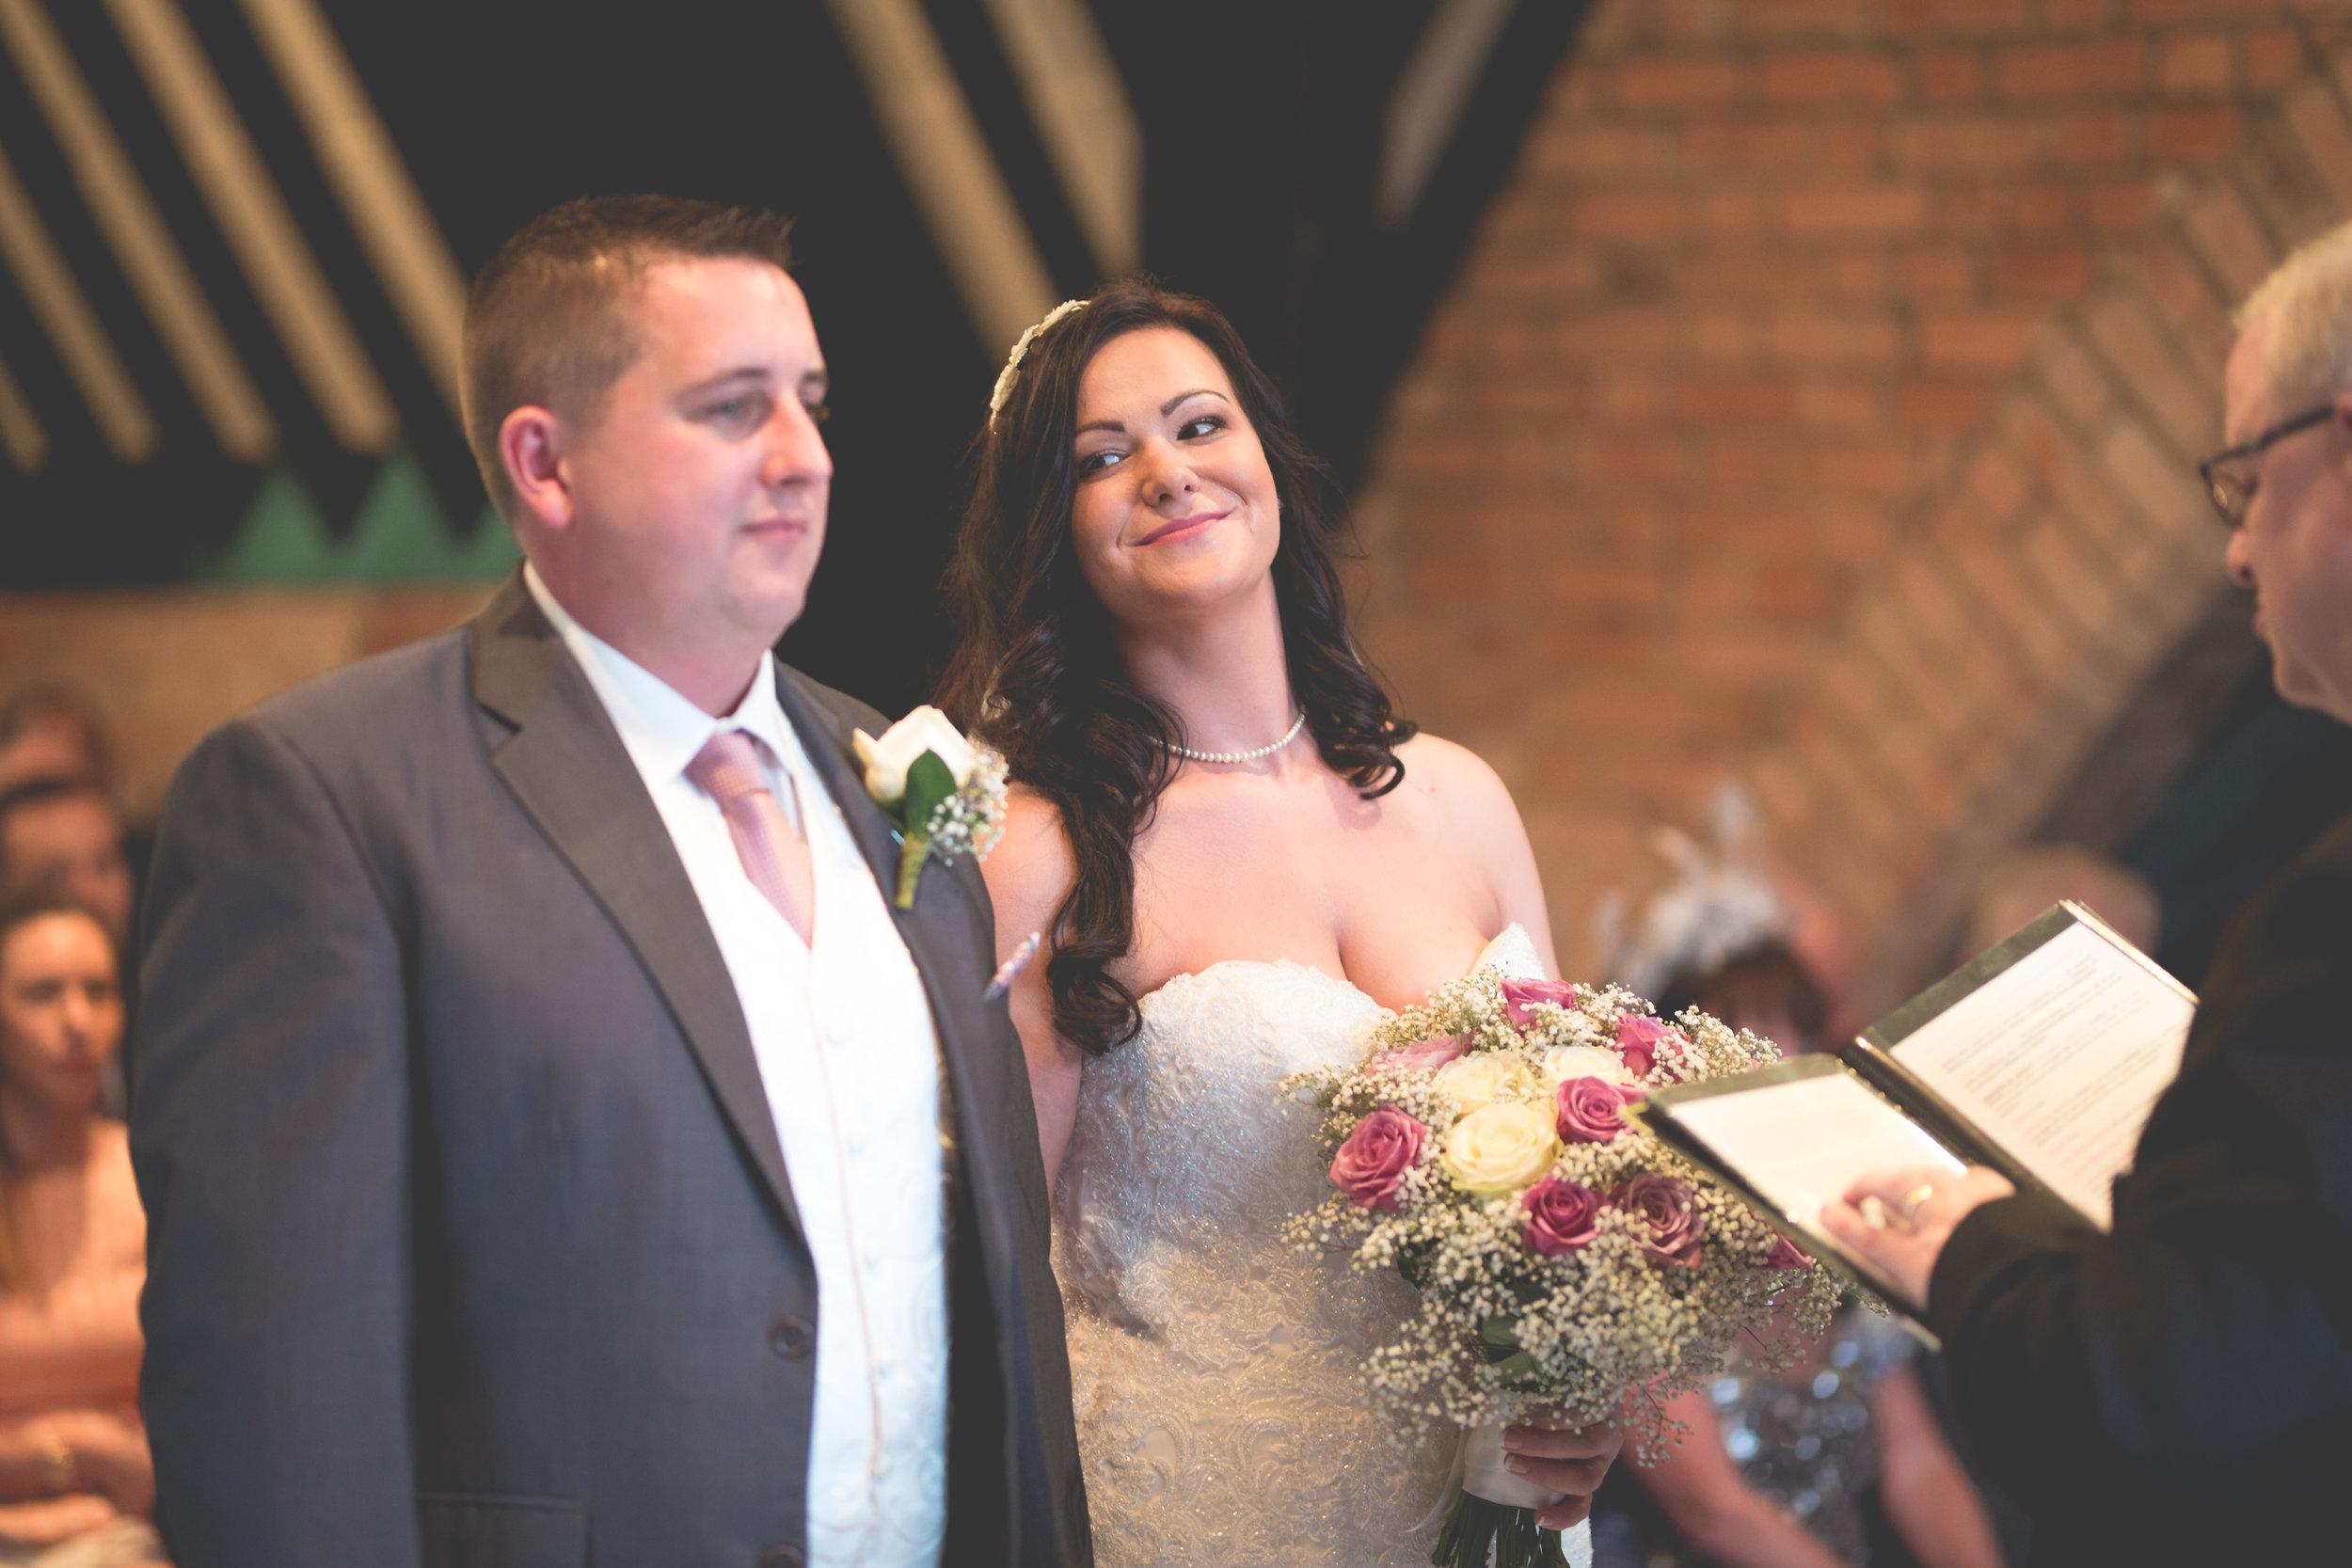 Helena & Terence - Ceremony-36.jpg